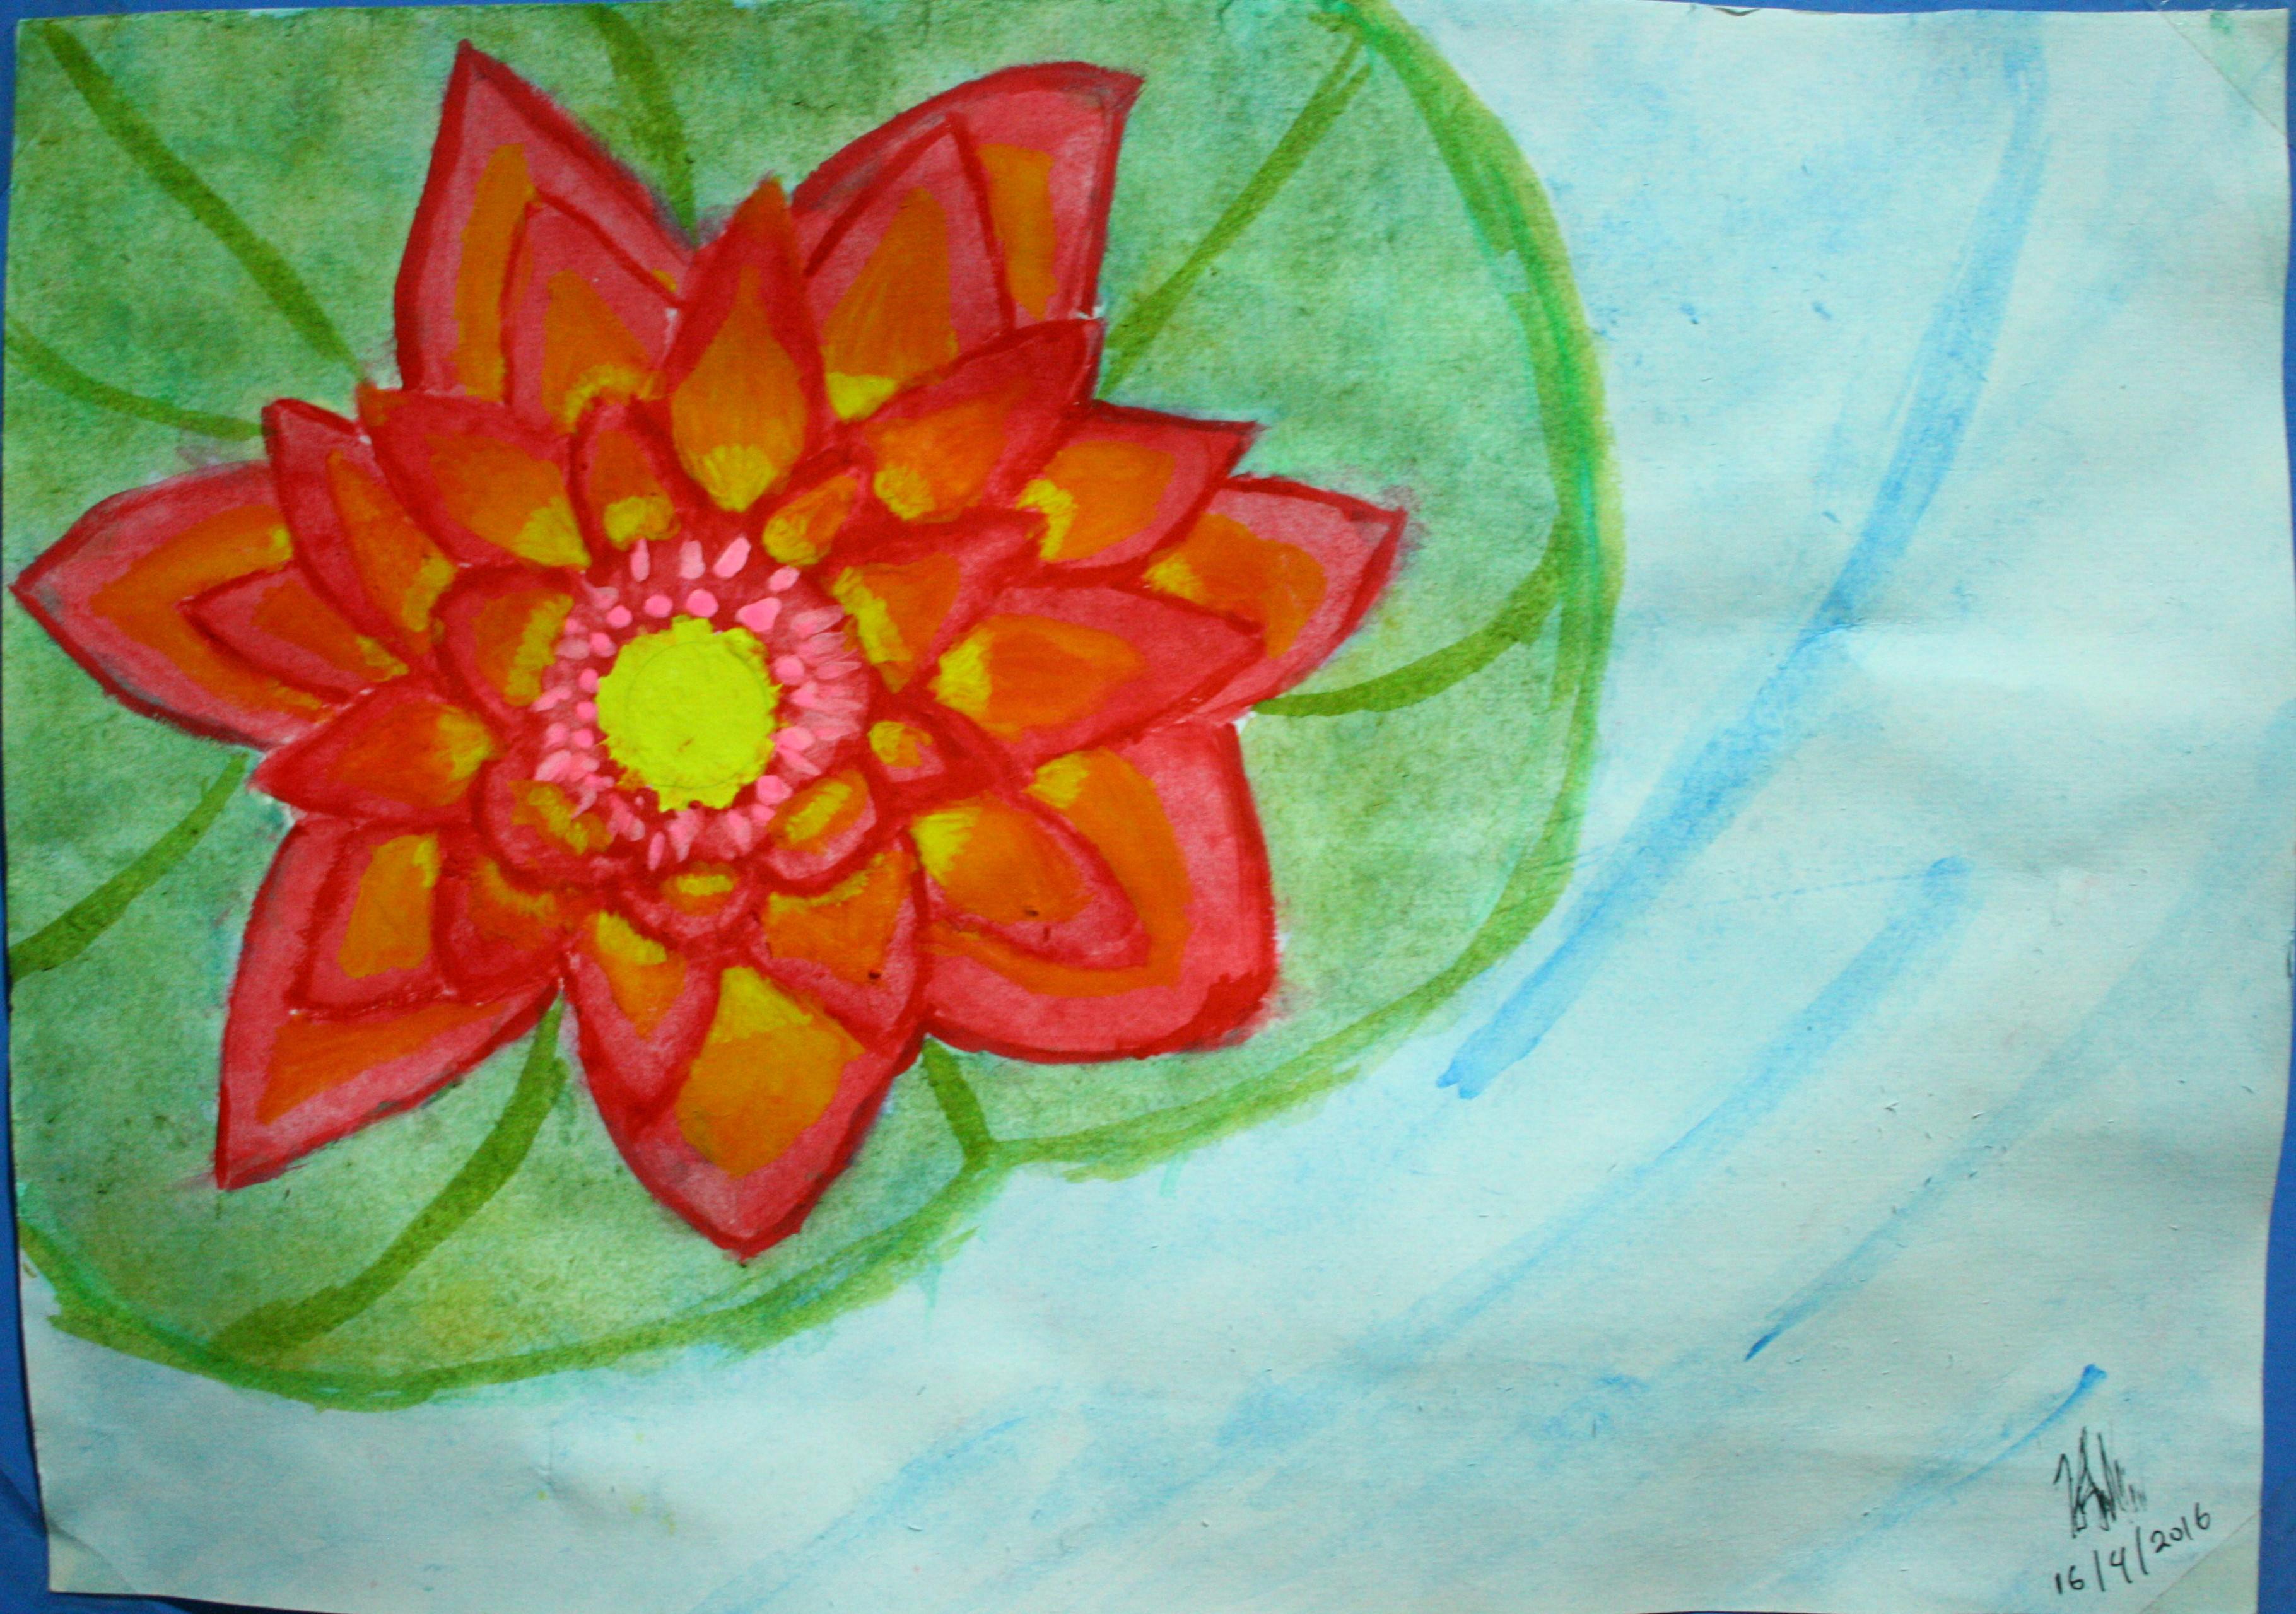 Crimson Lotus By Allucia On Newgrounds